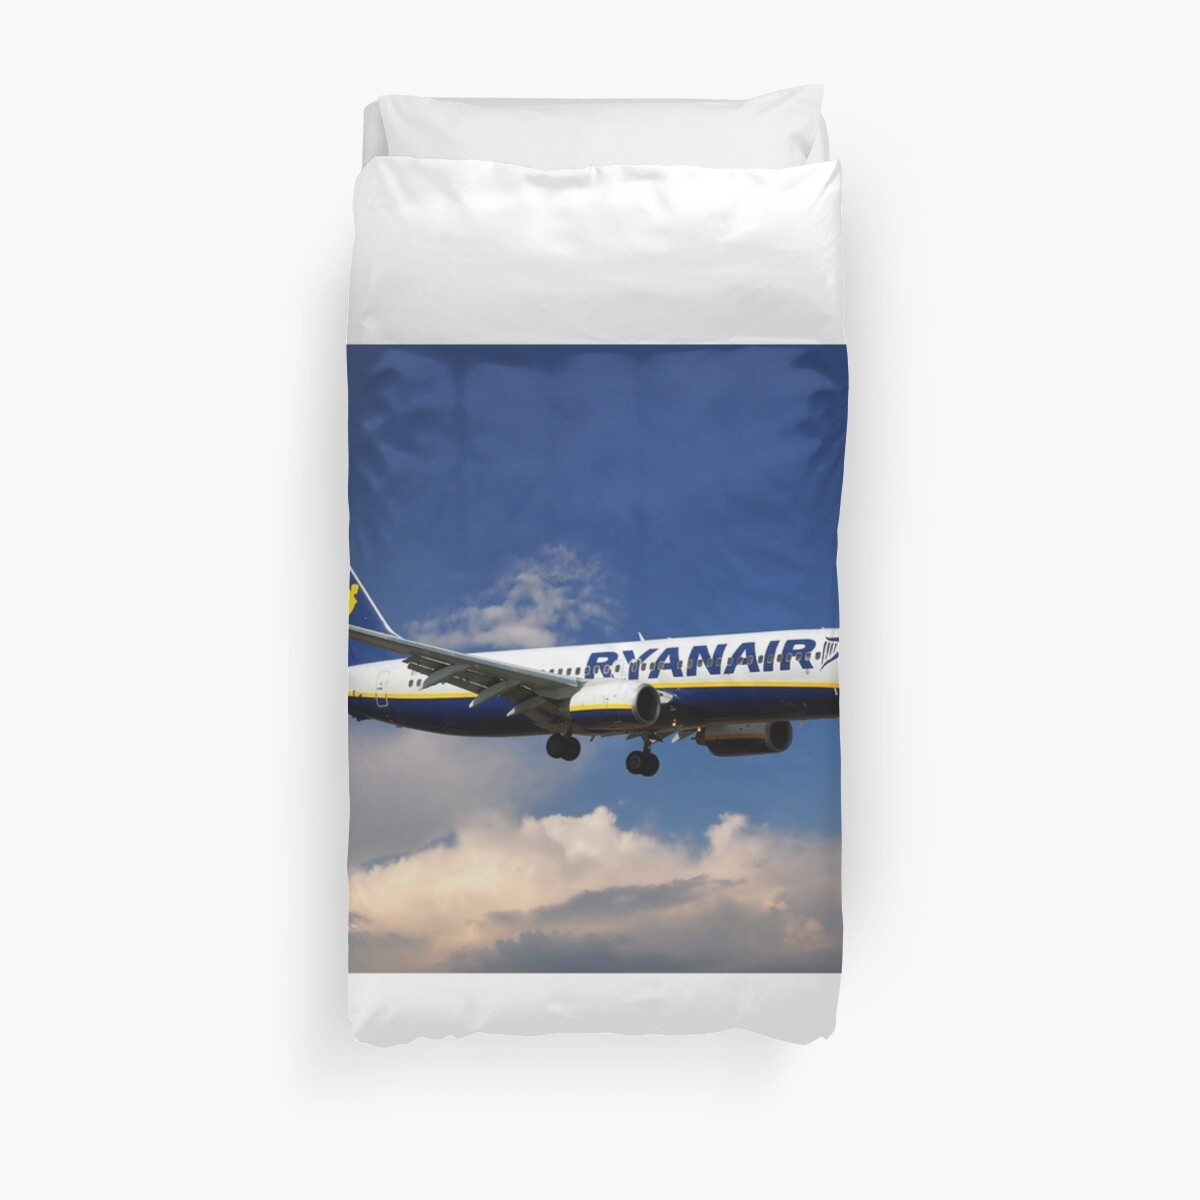 Ryanair Boeing 737-8AS  by Smart Aviation